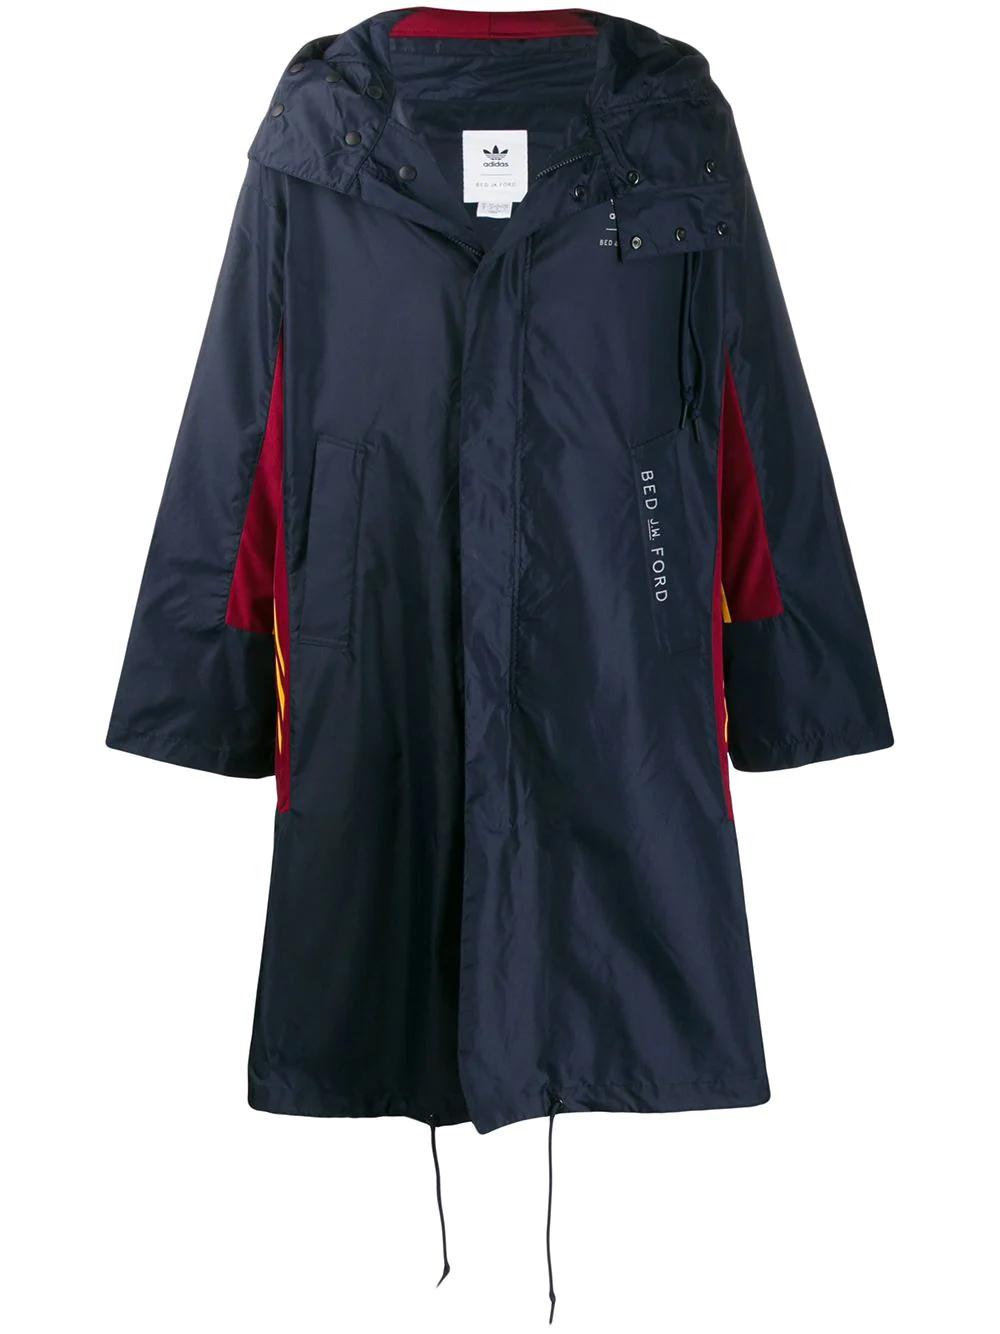 adidas Originals   adidas Originals легкое пальто из коллаборации с Bed J.W. Ford   Clouty